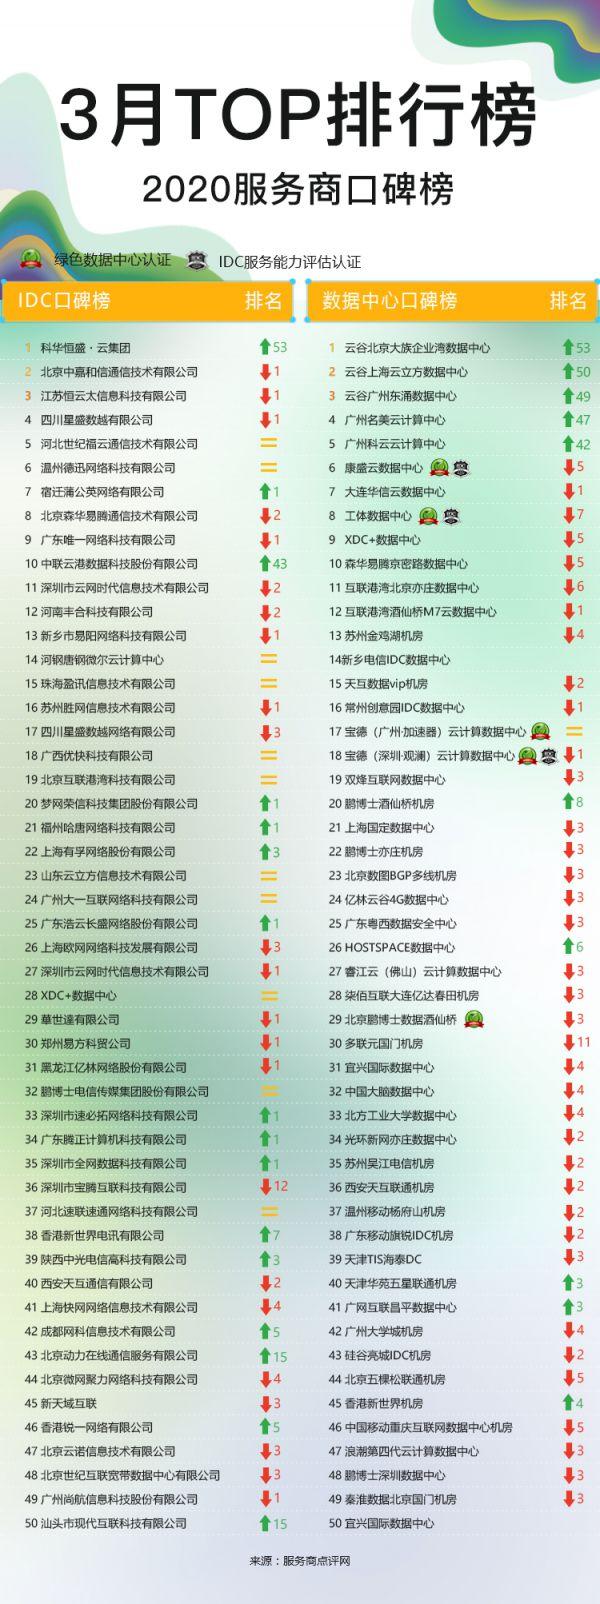 IDC排行榜网页版